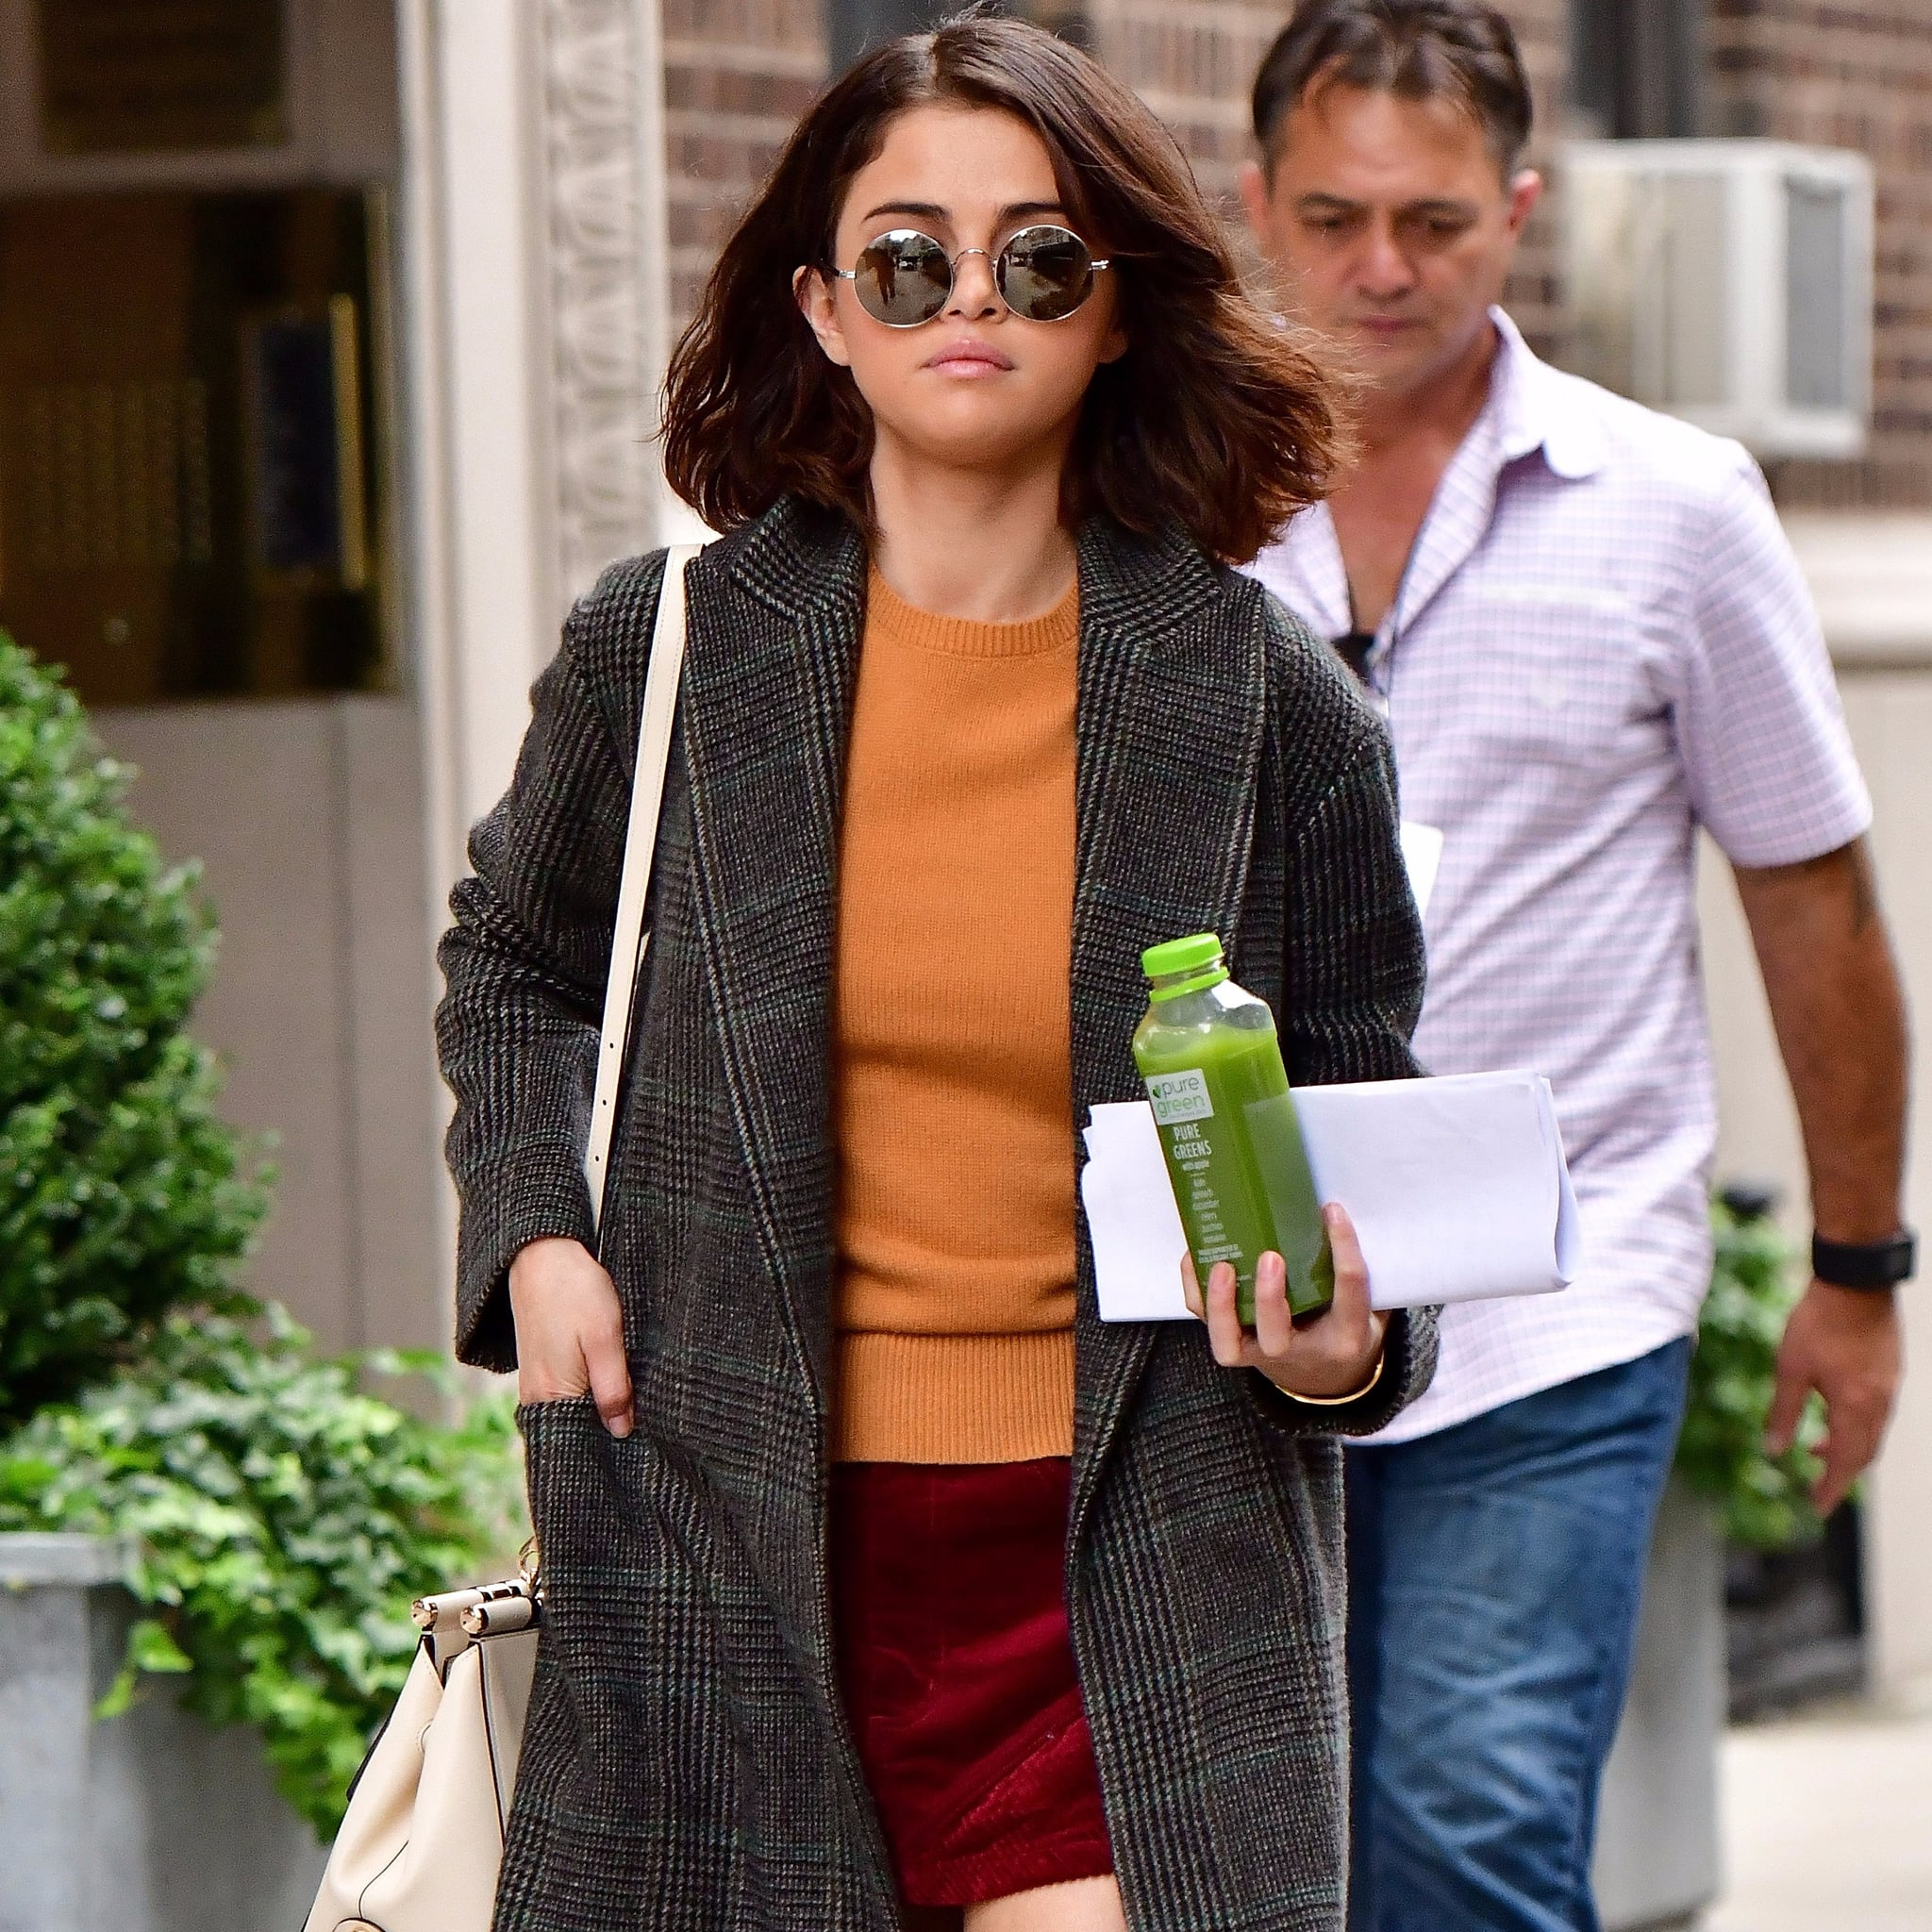 353d37b001 Selena Gomez s Orange Sweater and Red Skirt